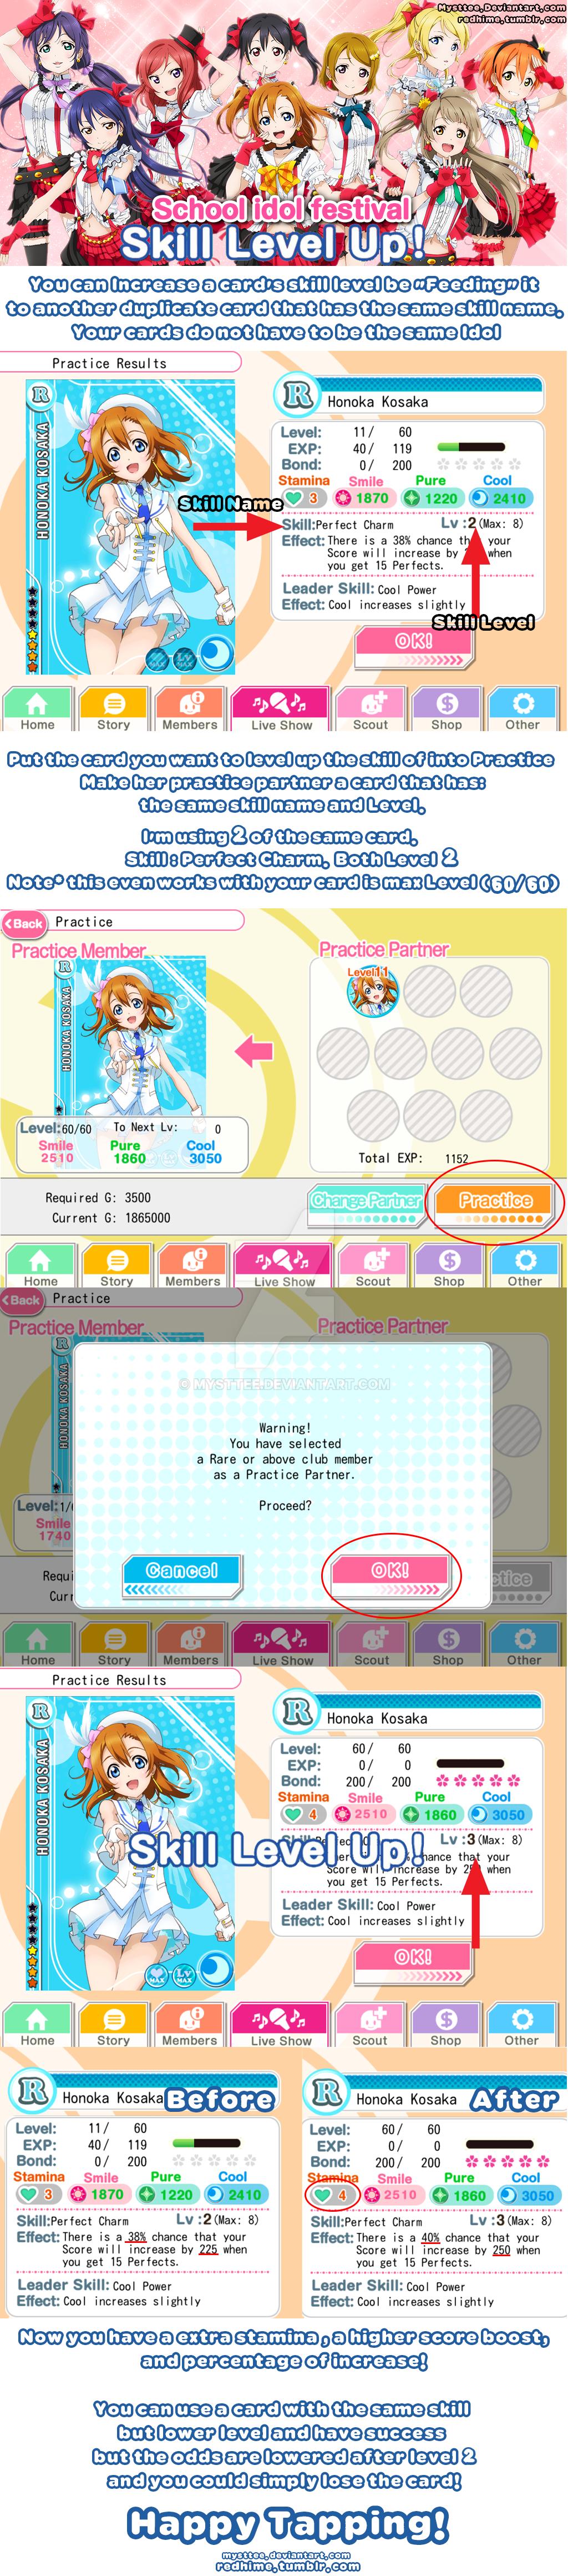 how to get school idol skills